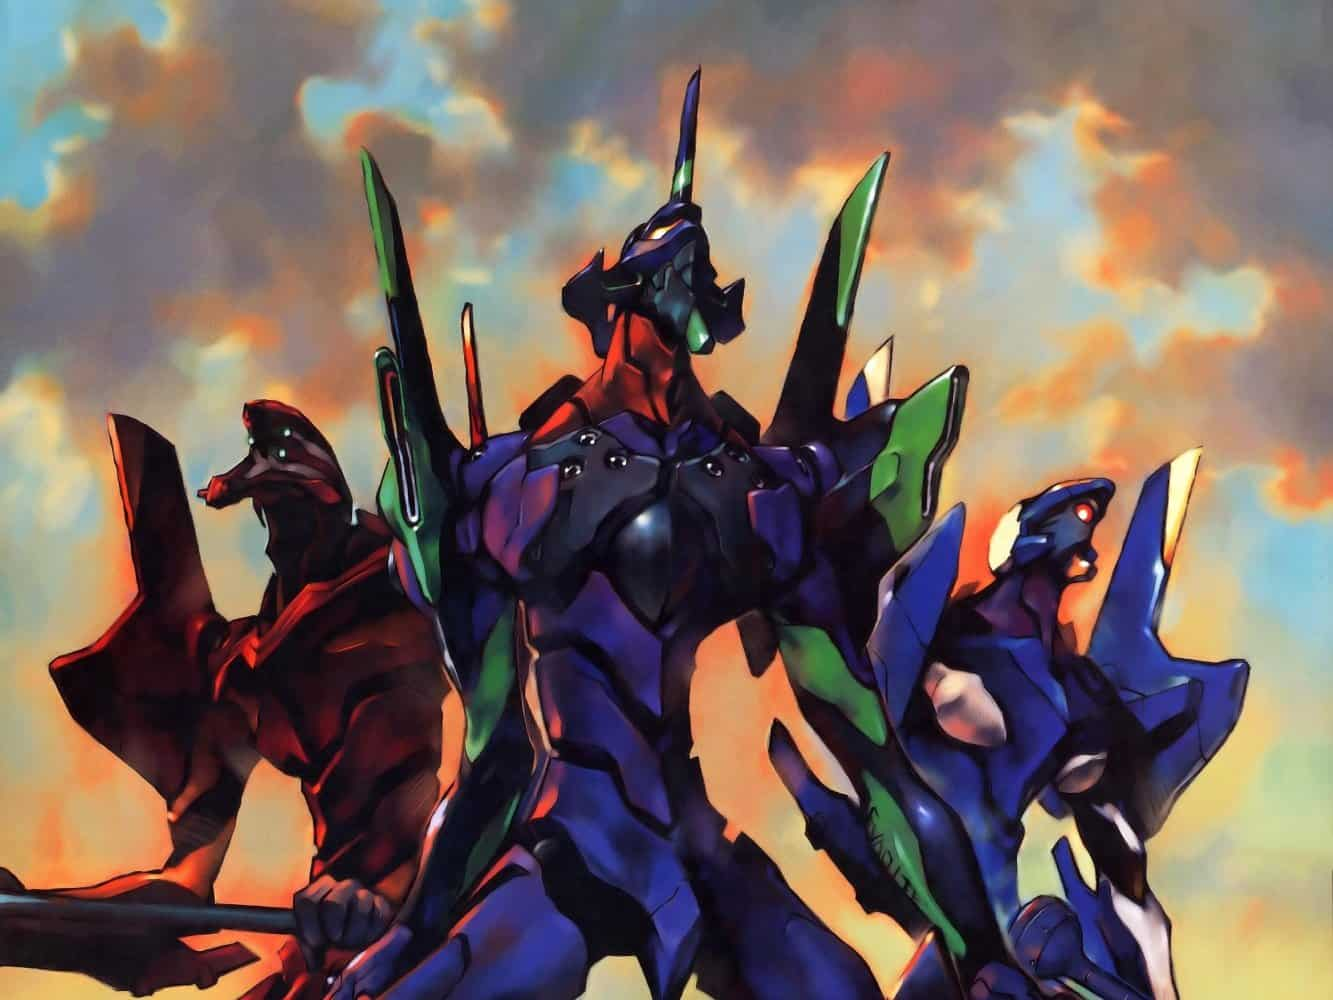 Neon Genesis Evangelion best Anime